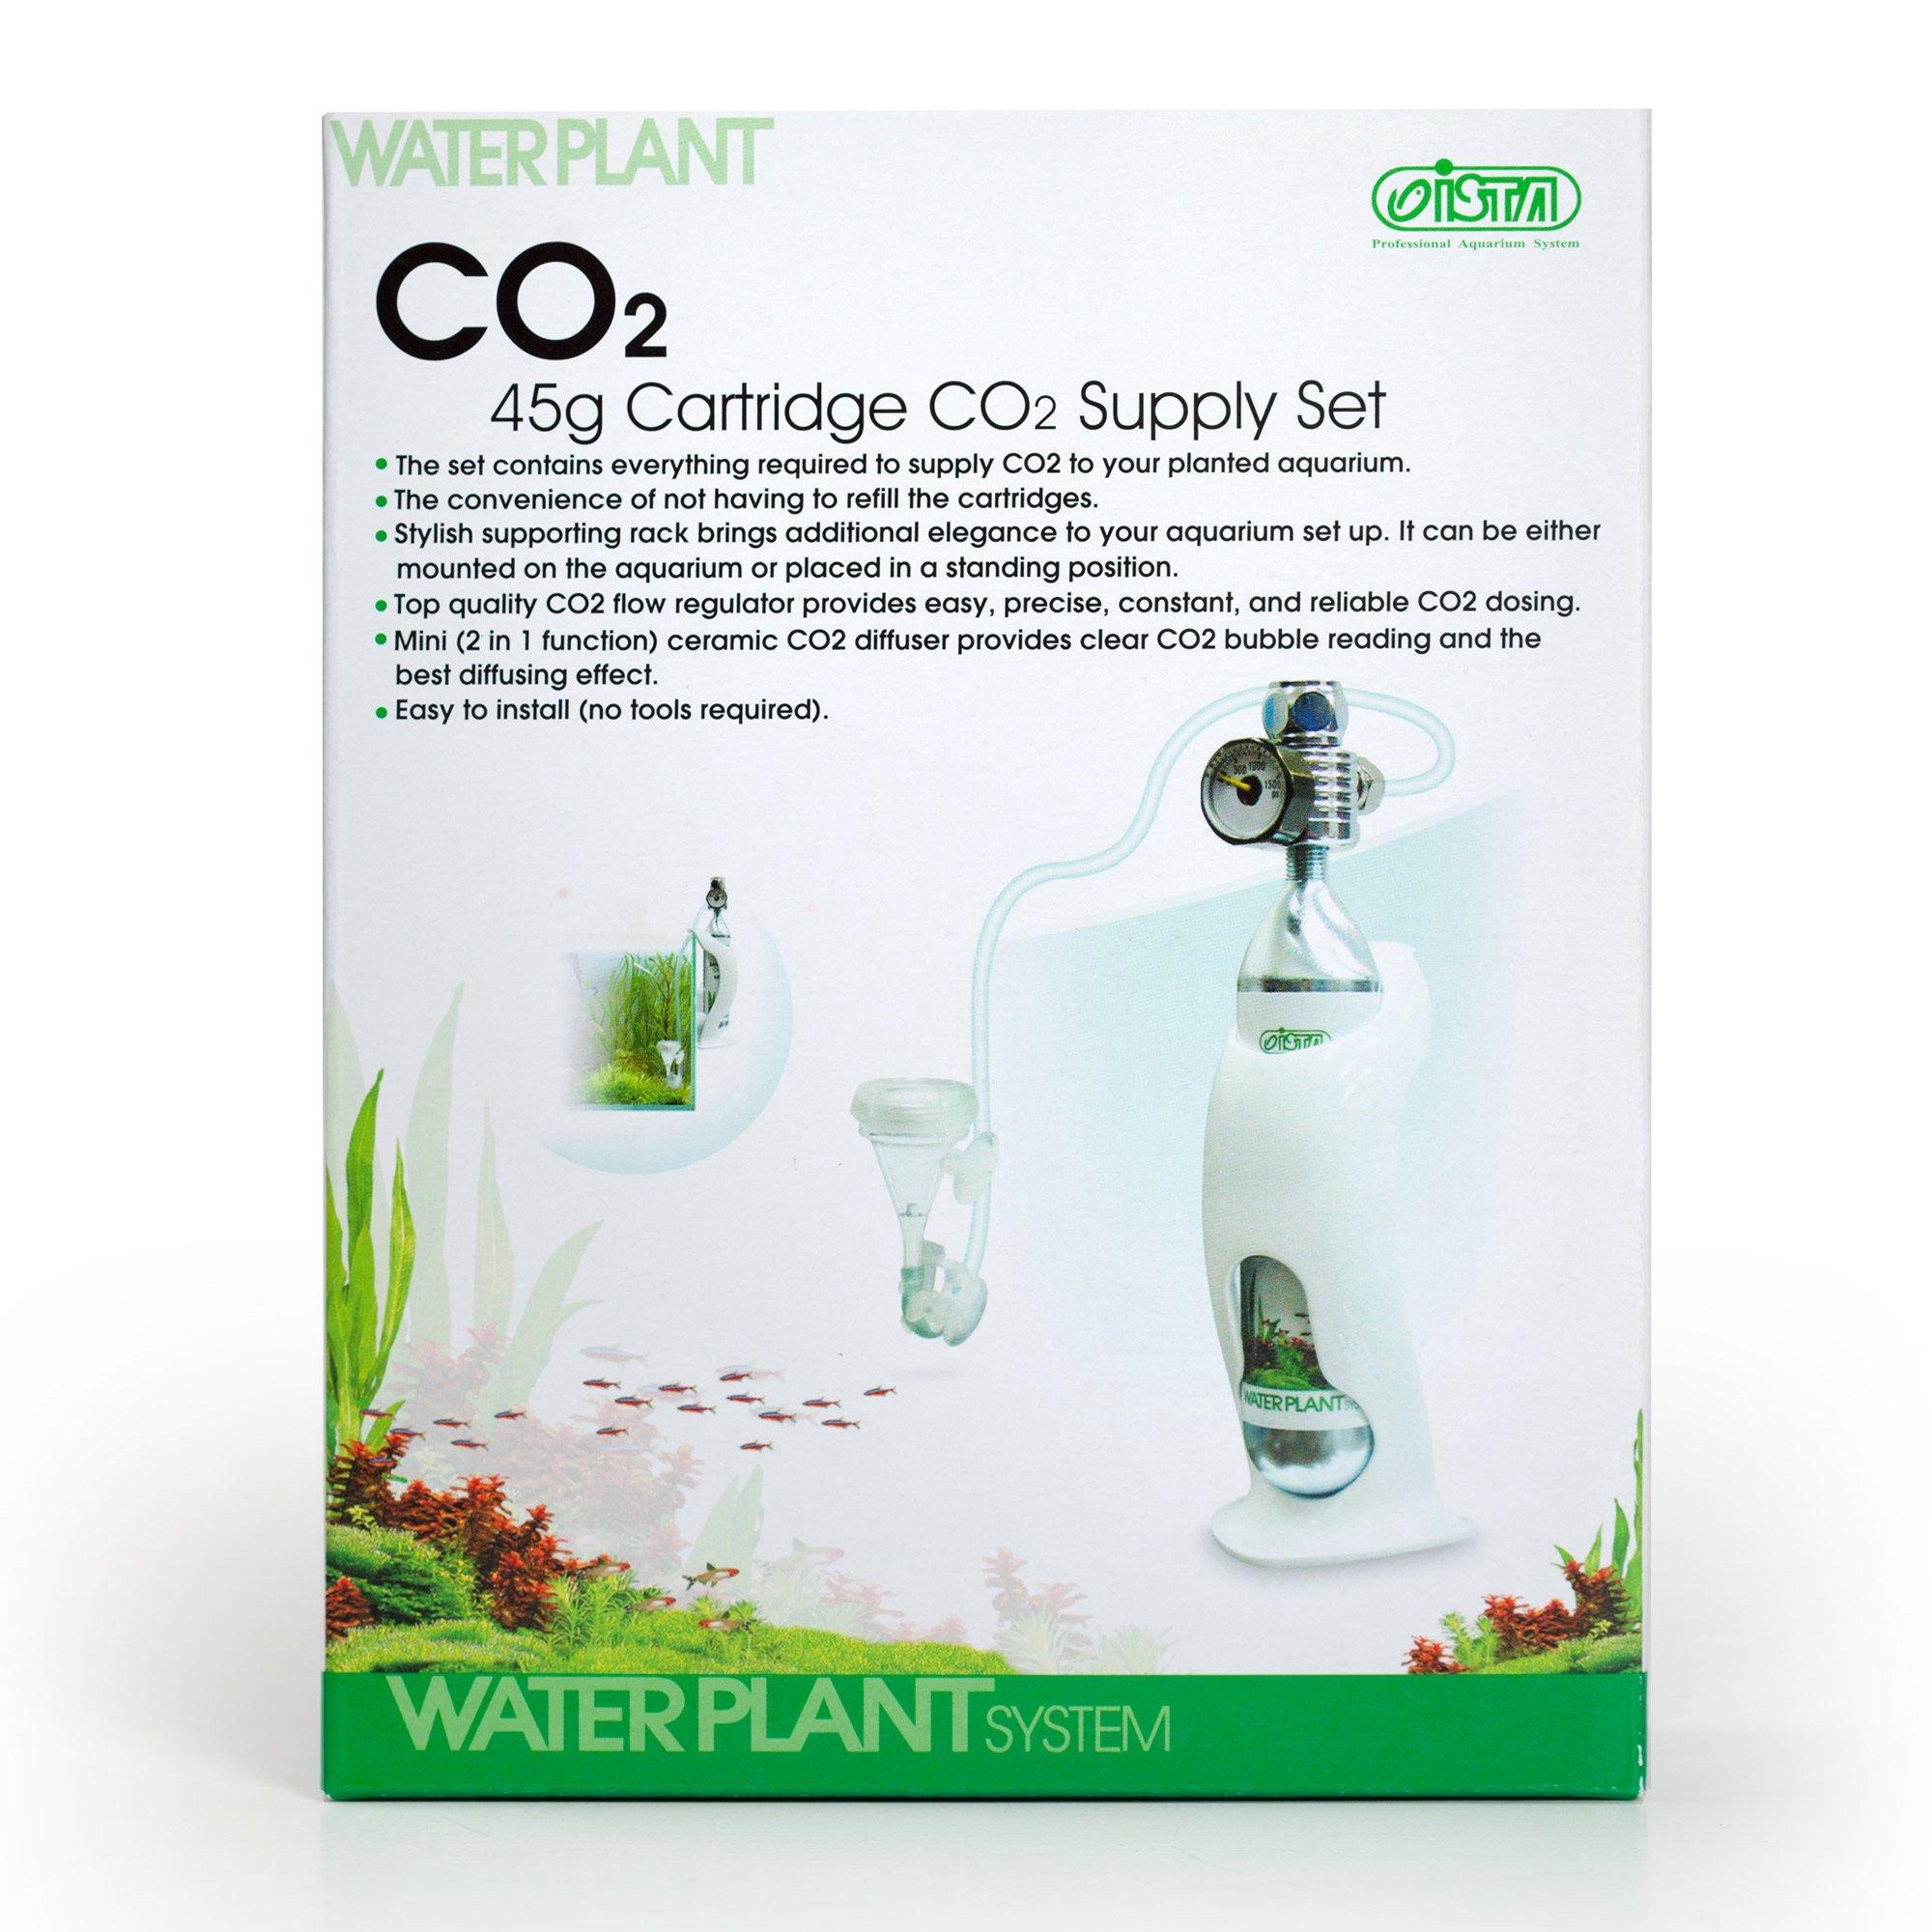 Gulfstream Tropical CO2 Cartridge Supply Set